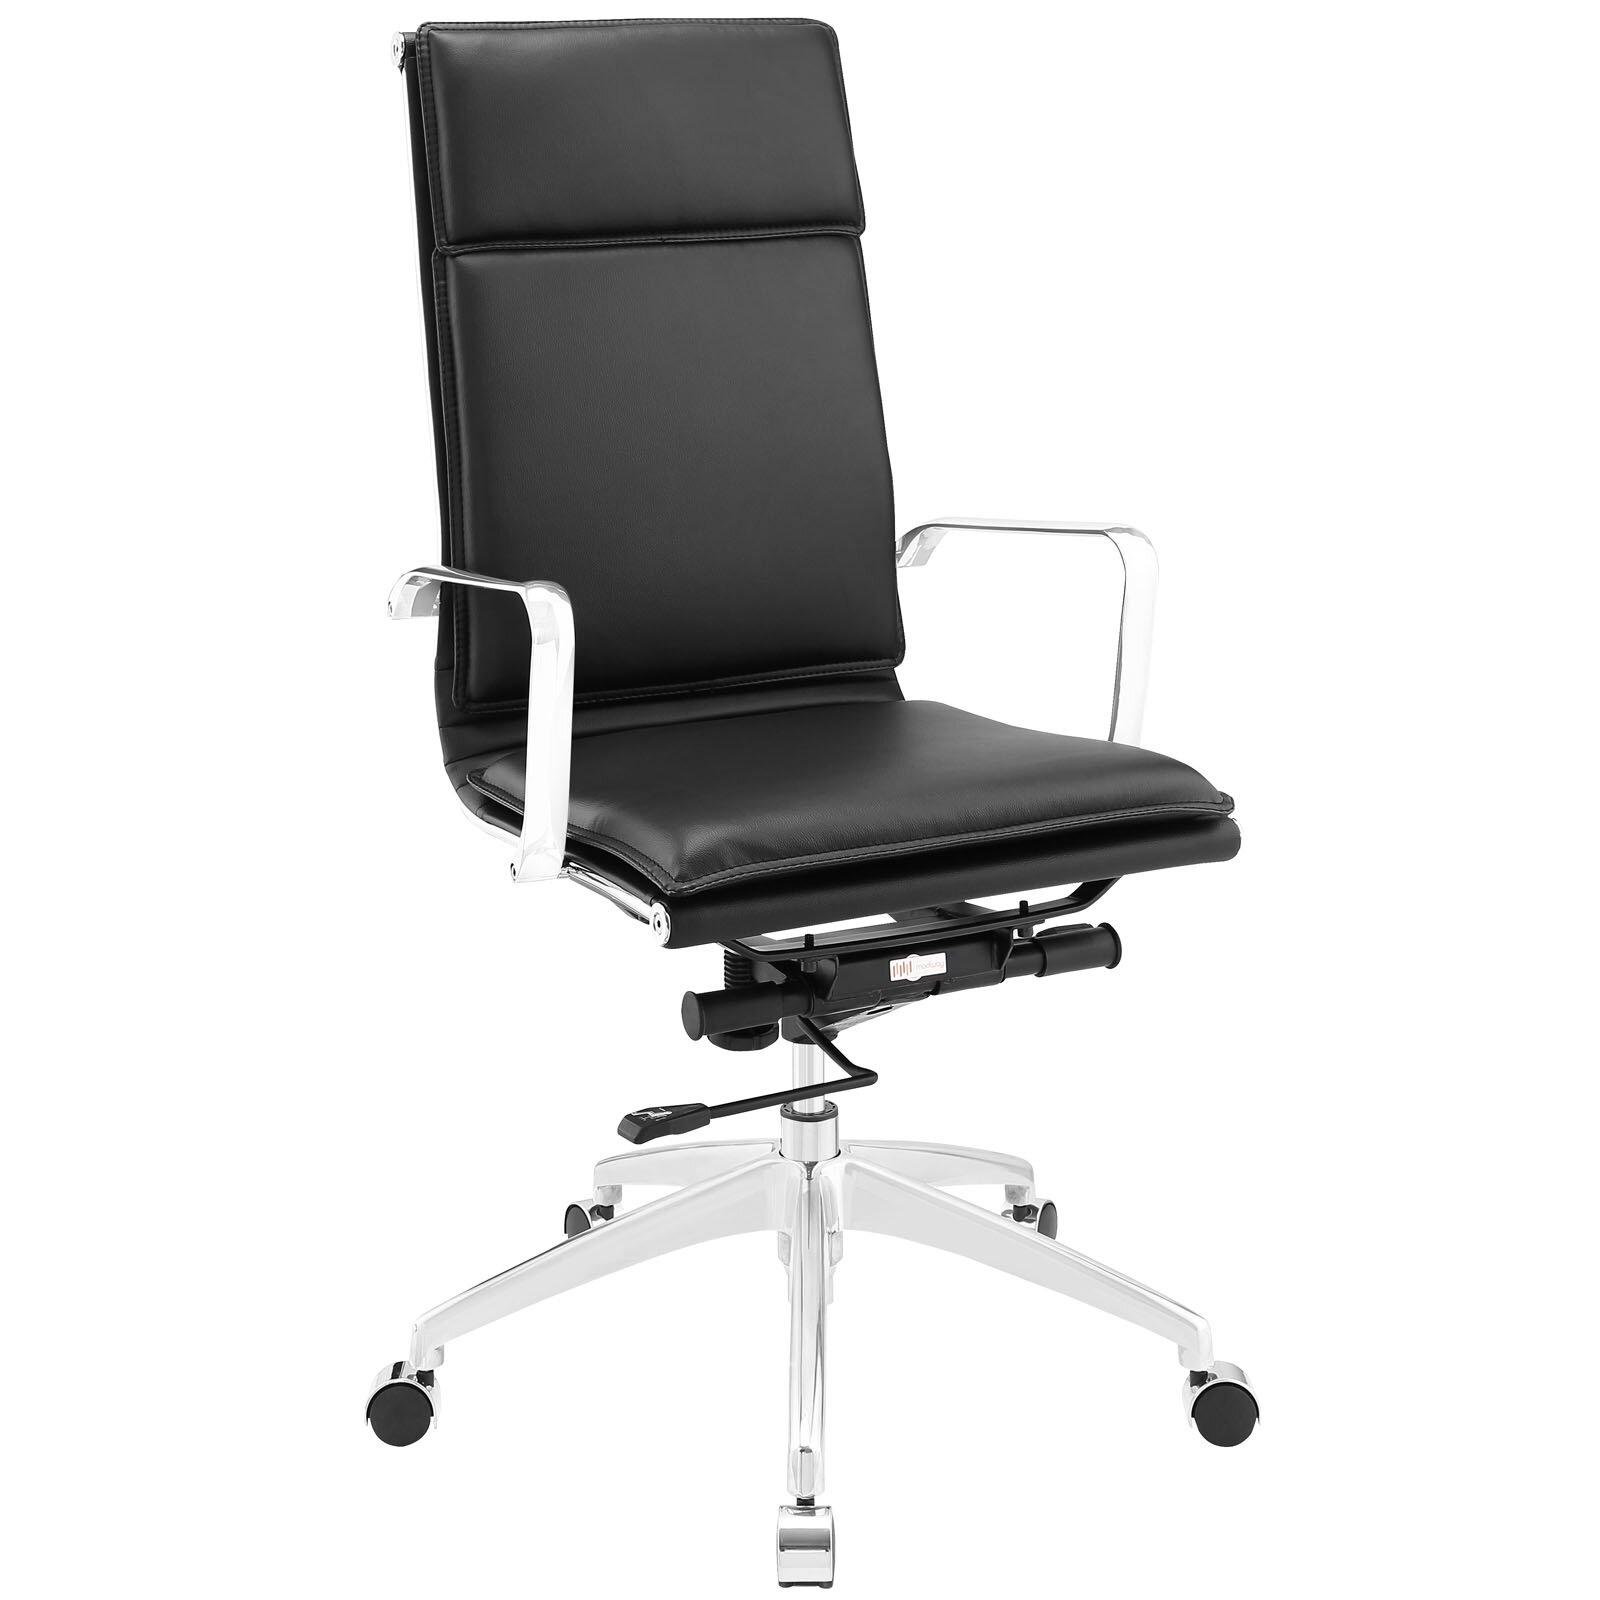 Modway Sage High Back Desk Chair Reviews Wayfair